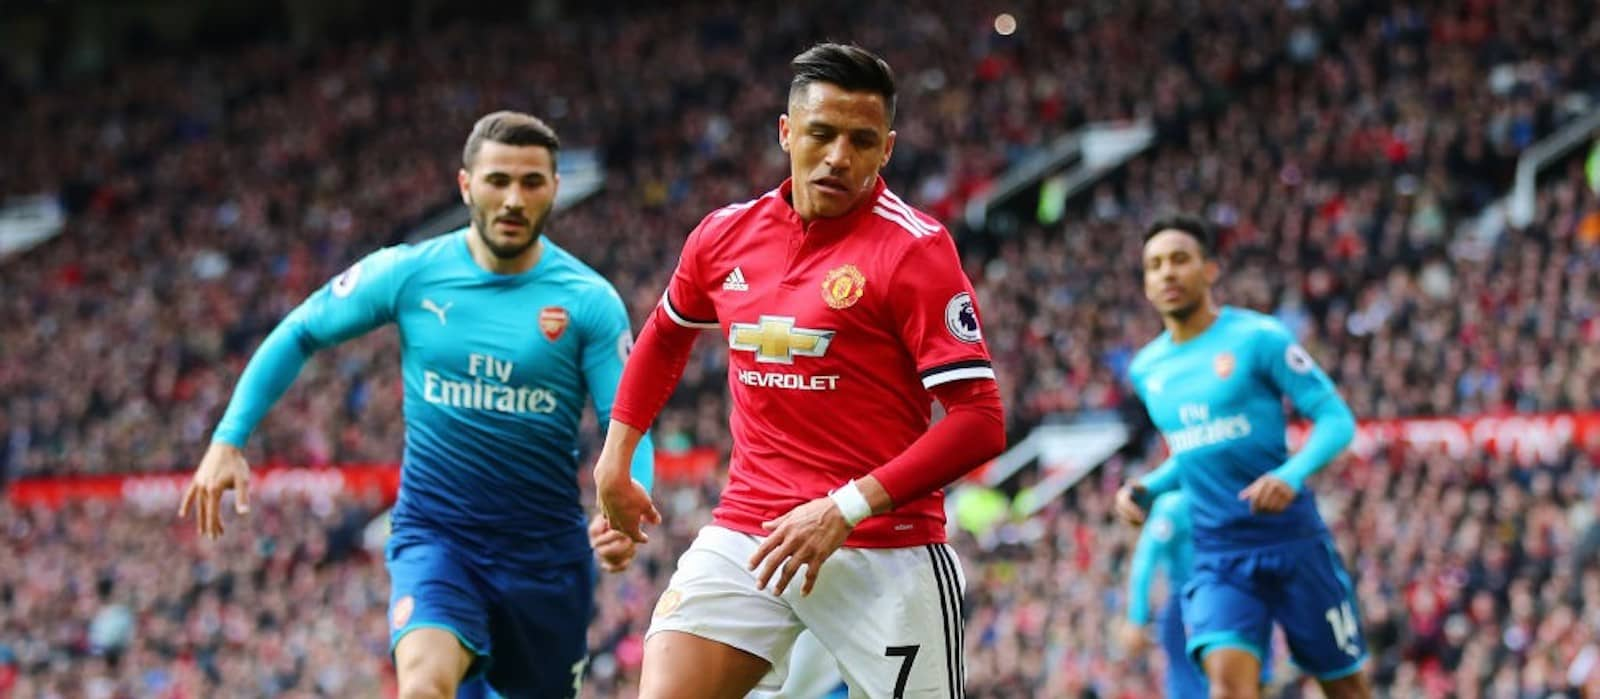 Manchester United fans encouraged by Alexis Sanchez's performance vs San Jose Earthquakes